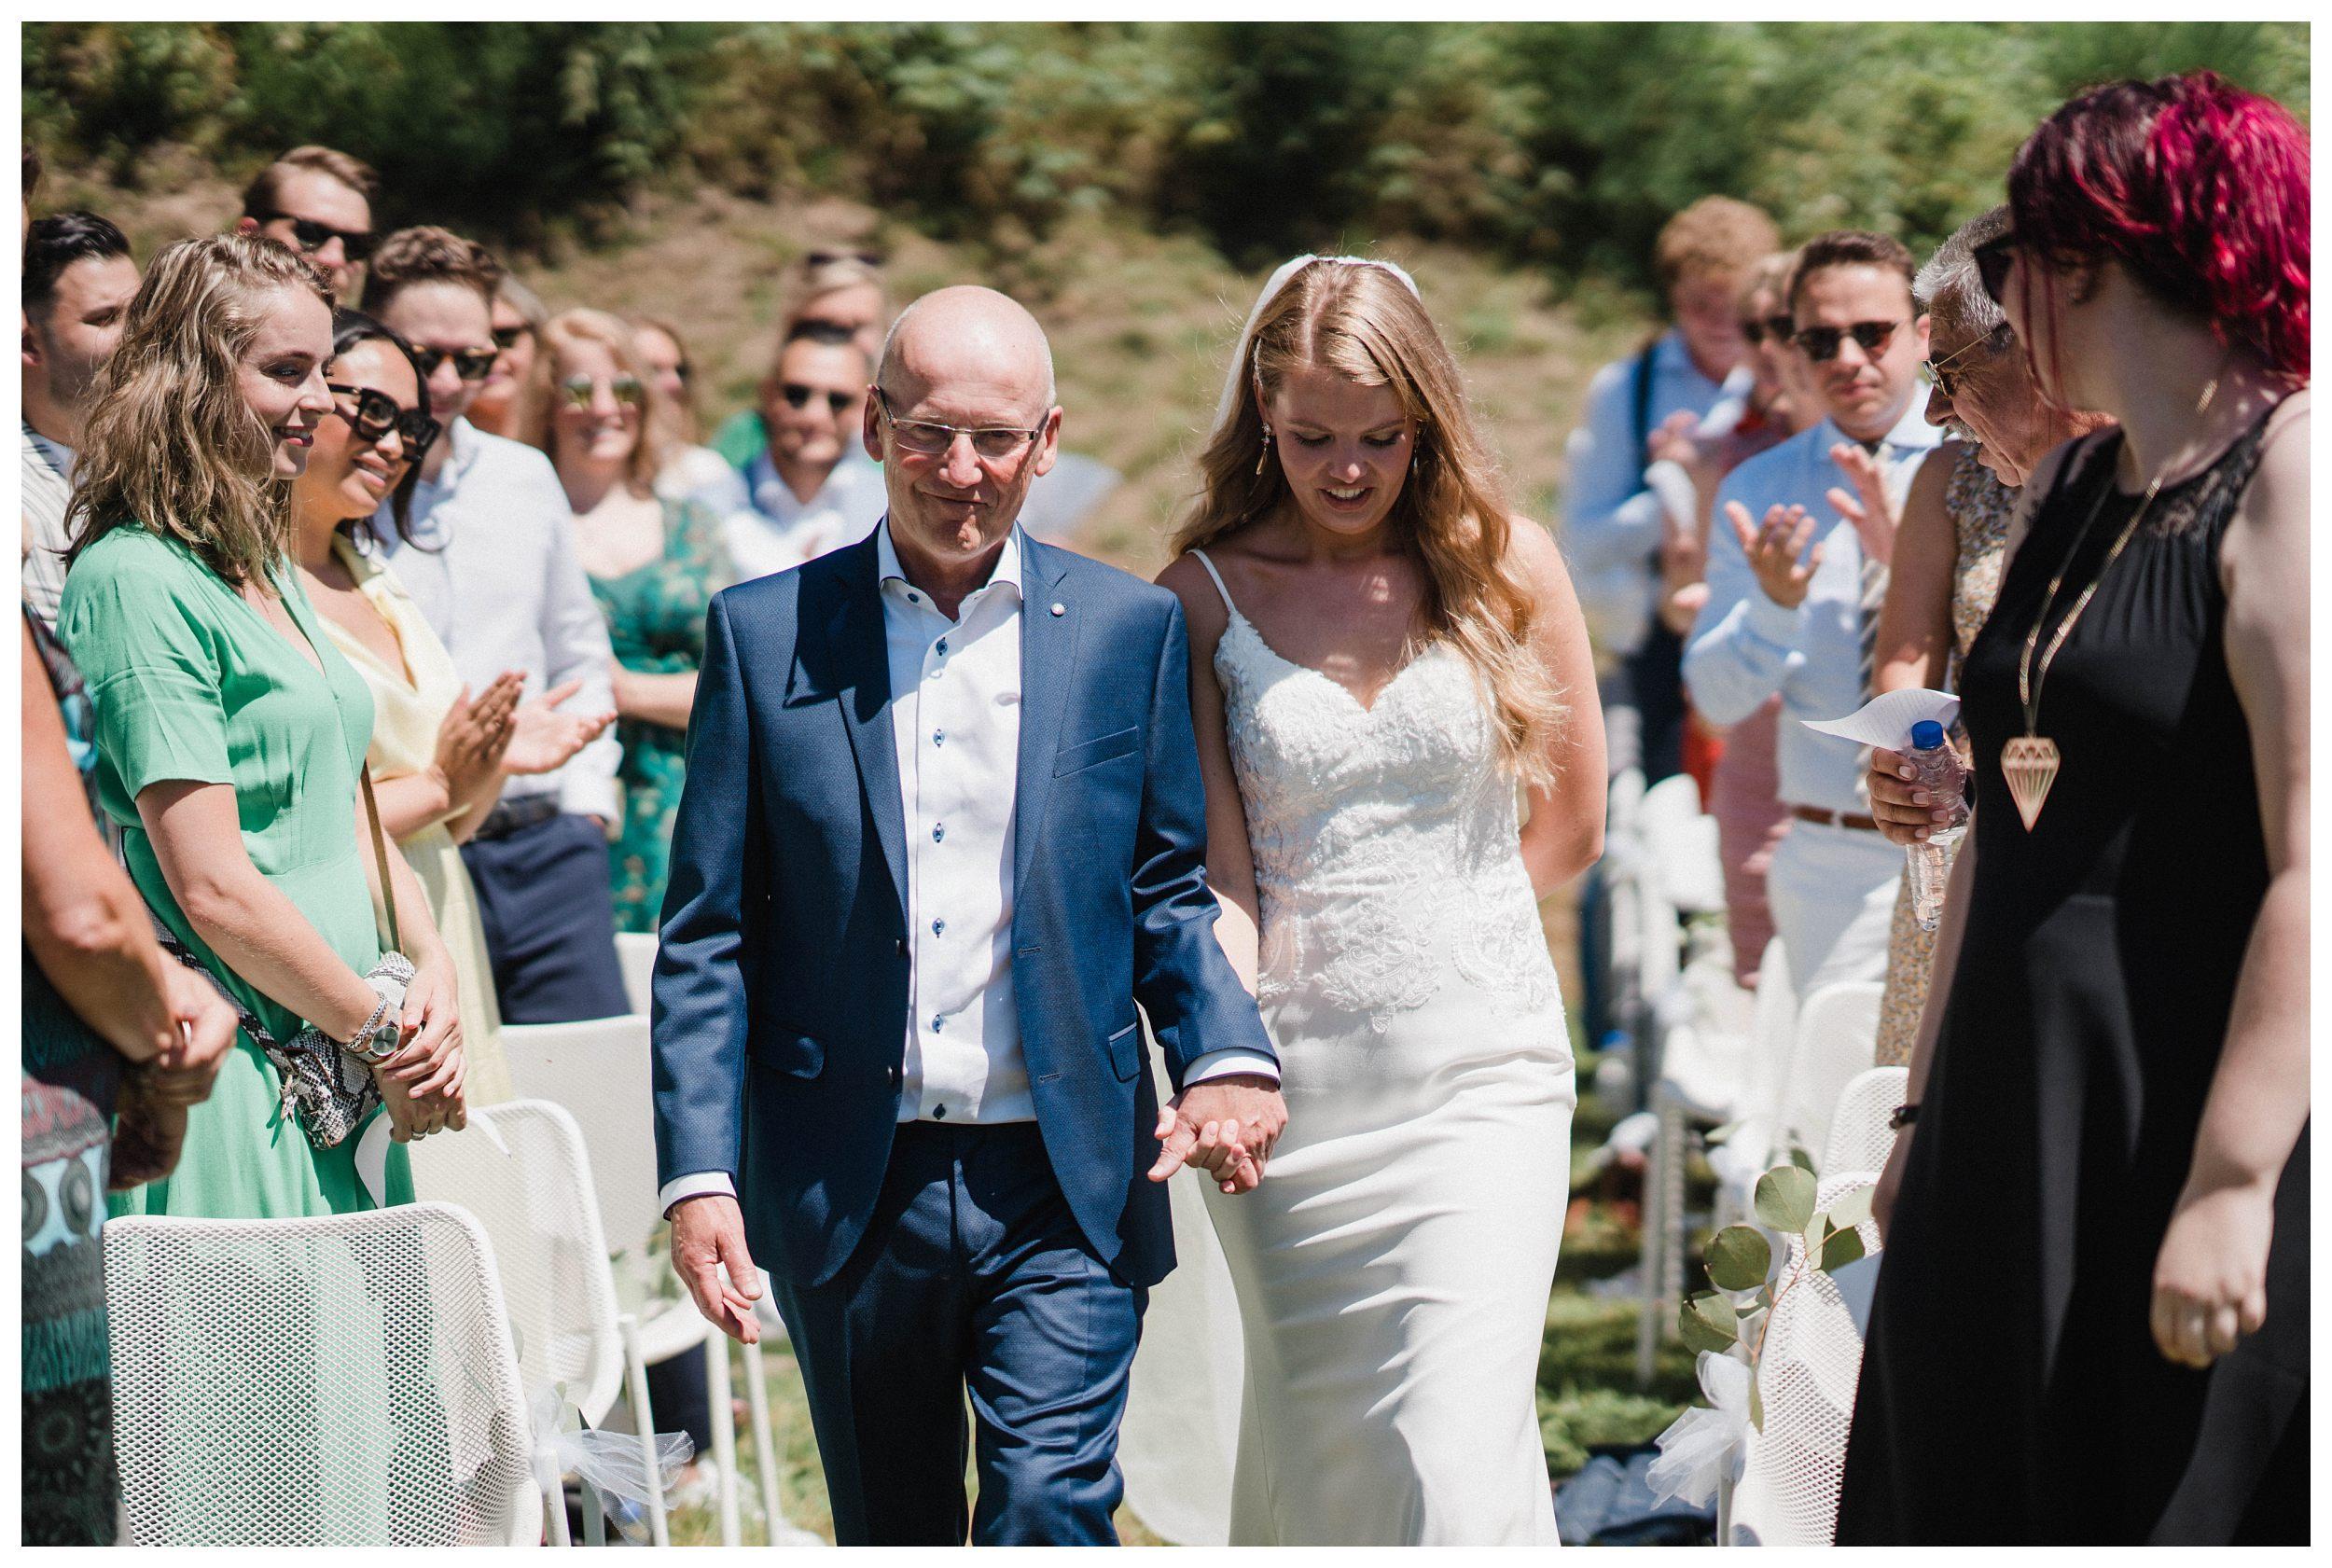 huwelijksfotograaf bruidsfotograaf destinationwedding huwelijksfotografie in ardennen nederland (65).jpg